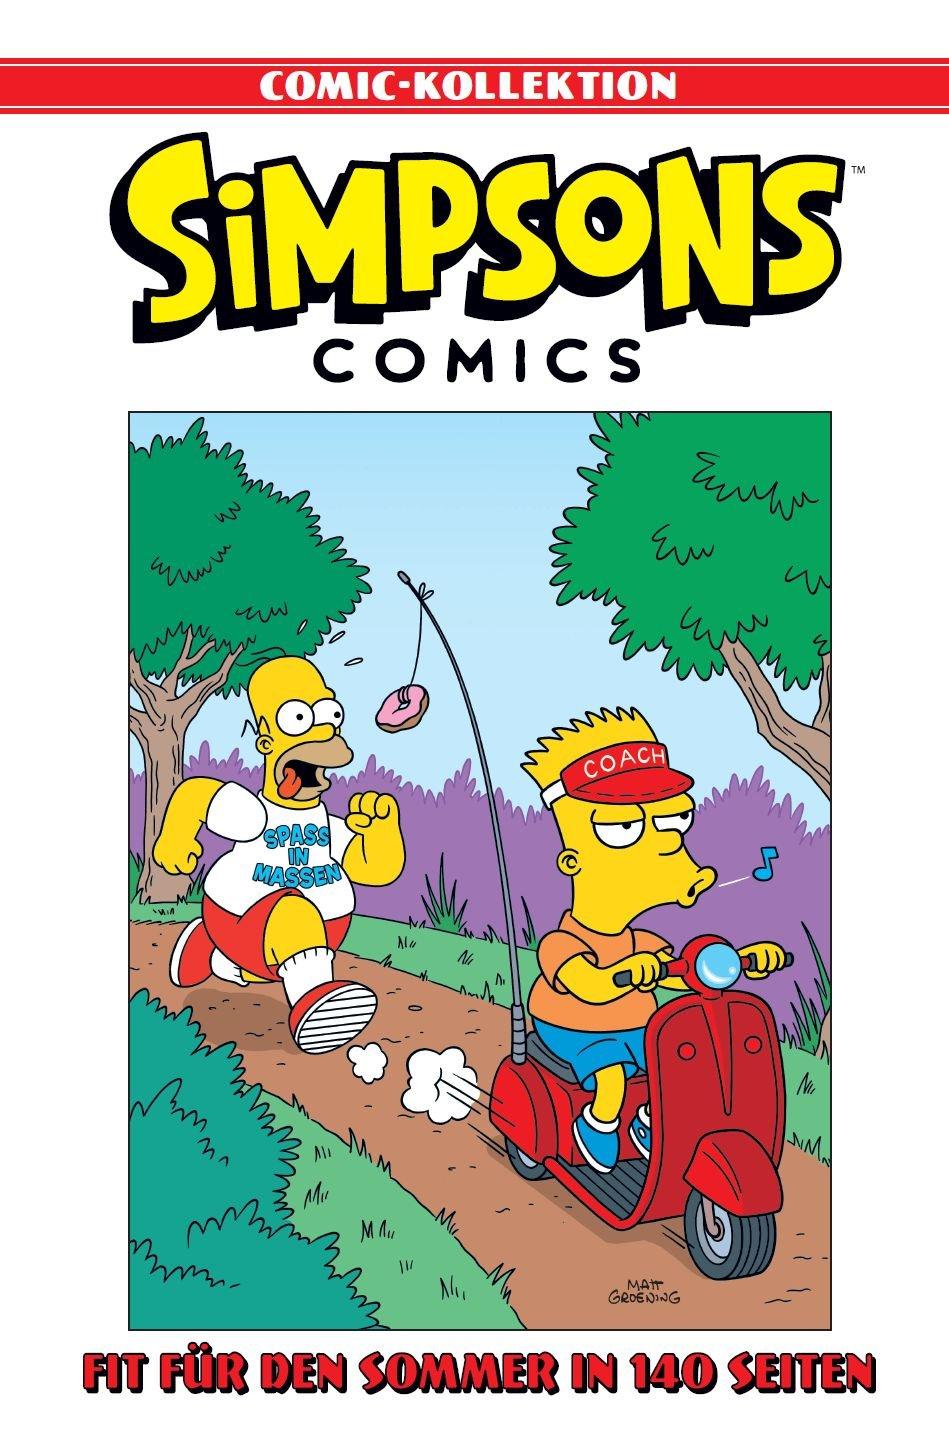 Simpsons Comic-Kollektion: Bd. 4: Fit für den Sommer in 140 Seiten Gebundenes Buch – 8. Mai 2018 Matt Groening Marc Andre Matthias Wieland Panini